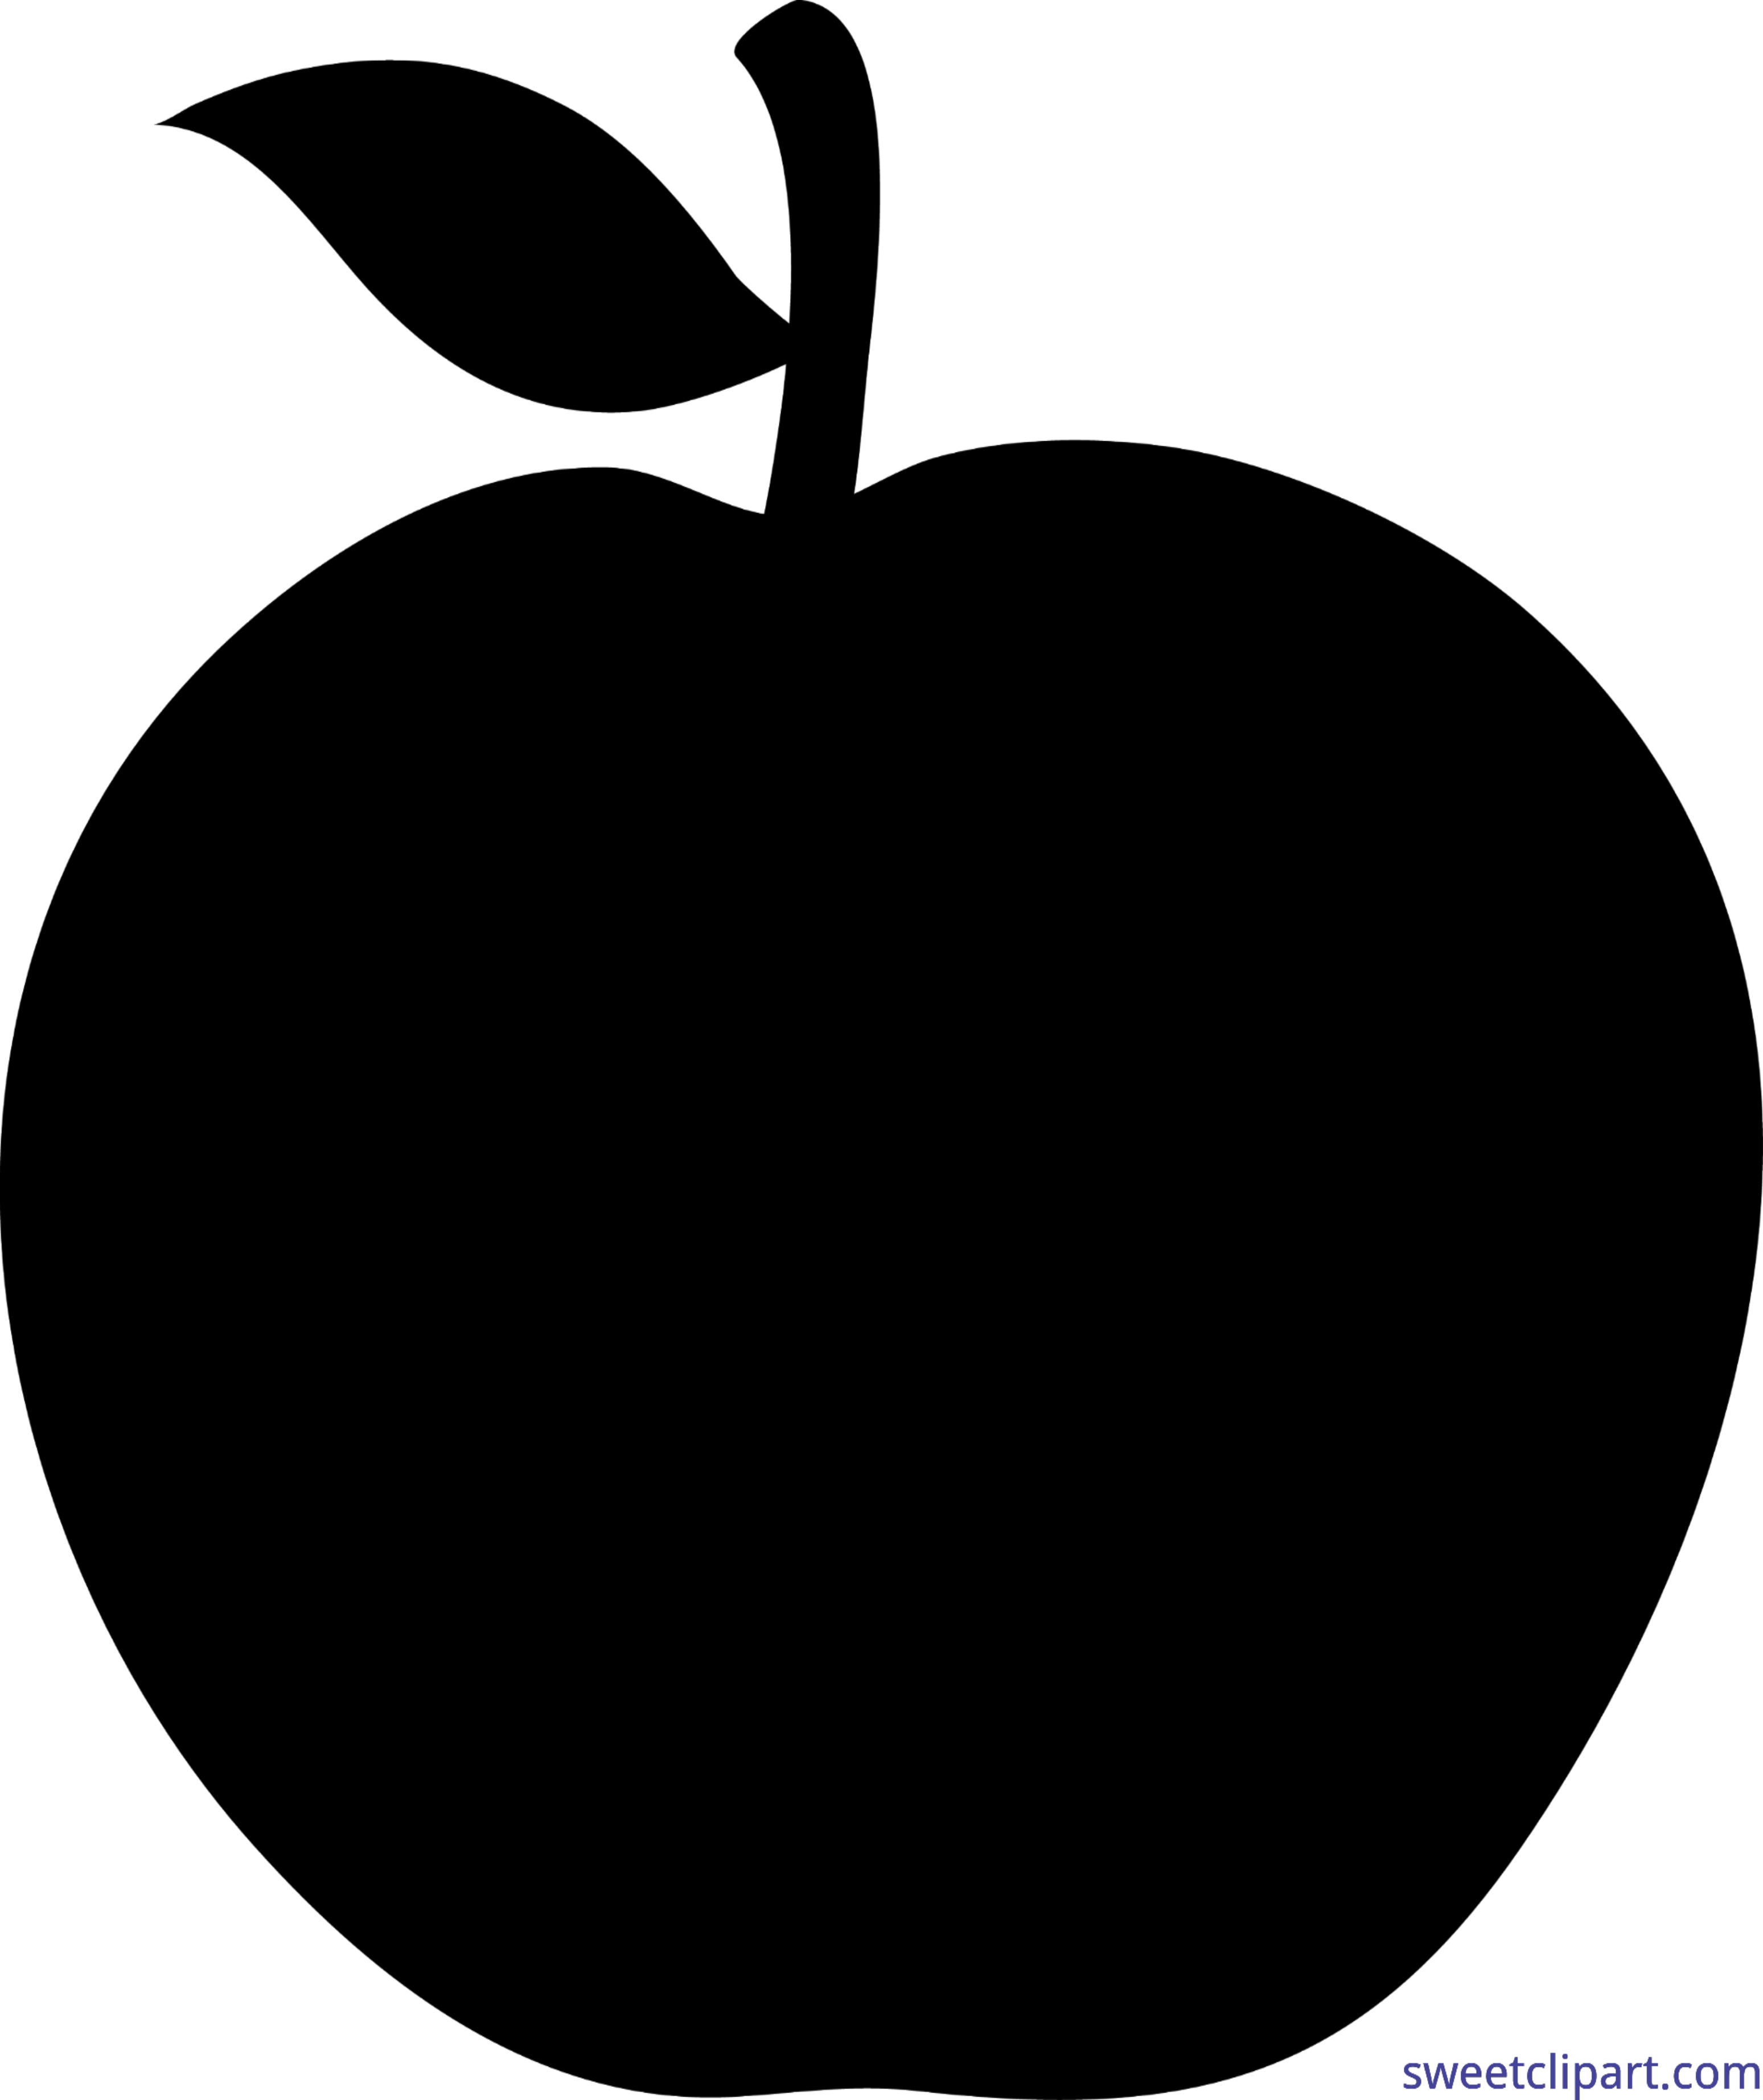 3097x3689 Apple Black Silhouette Clip Art